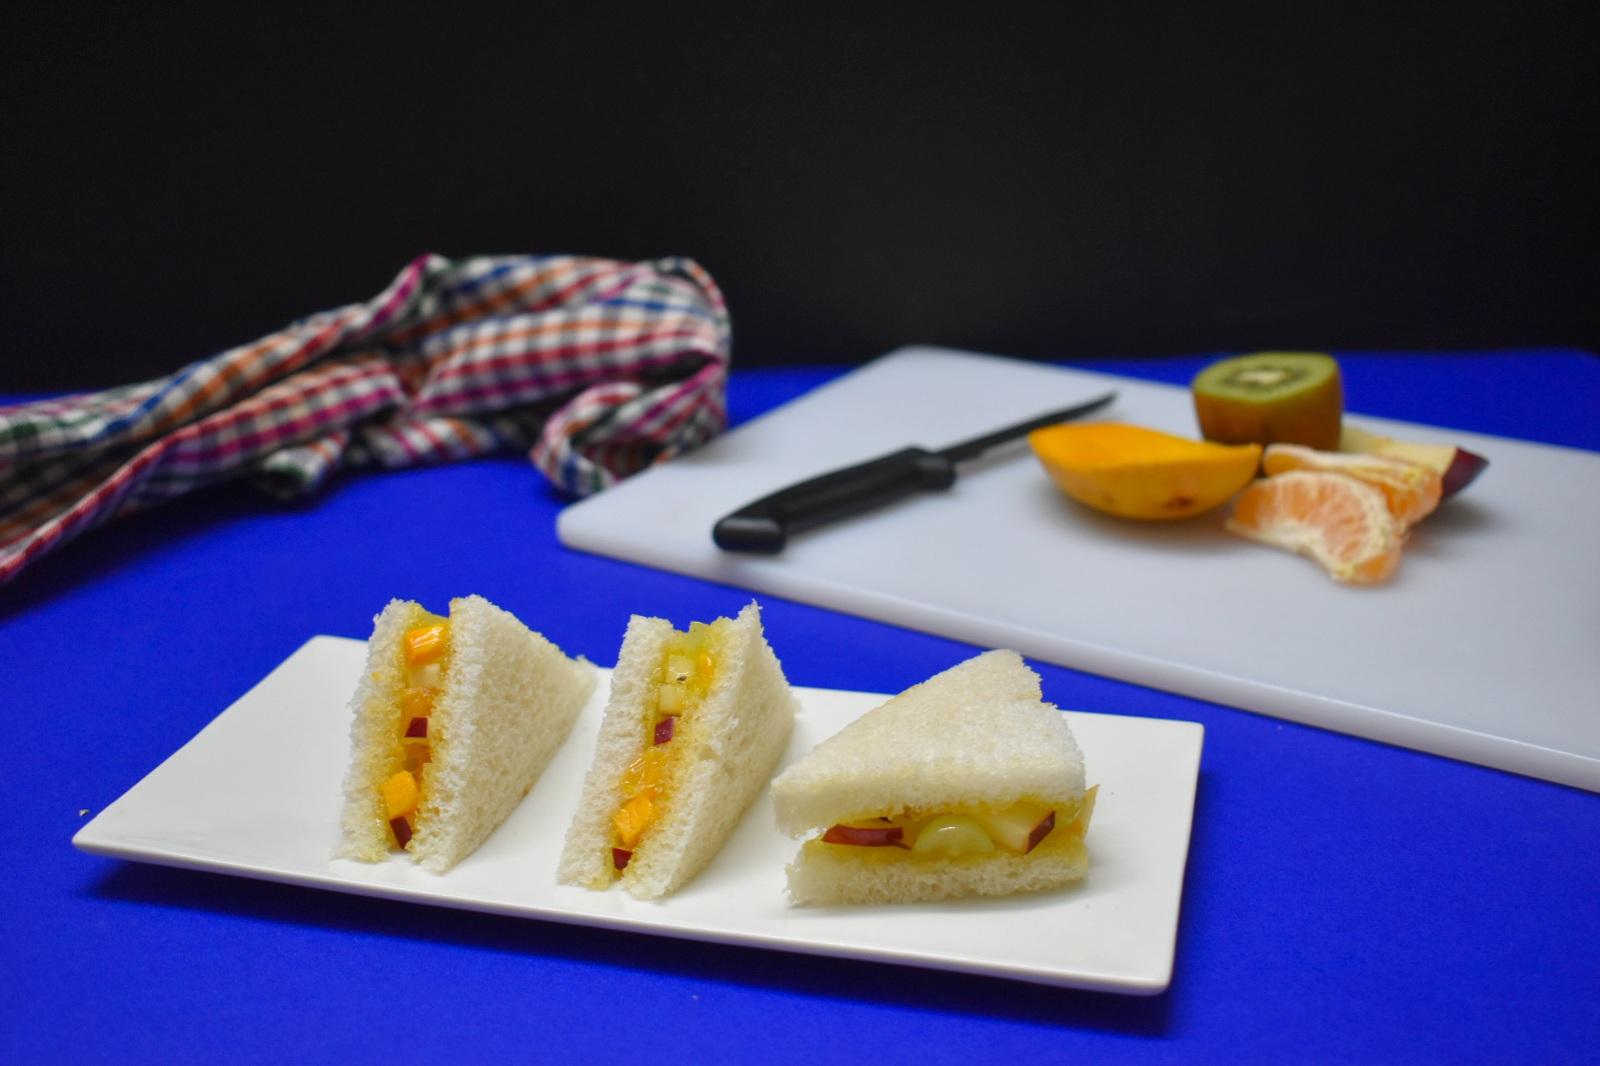 recipes using fruits